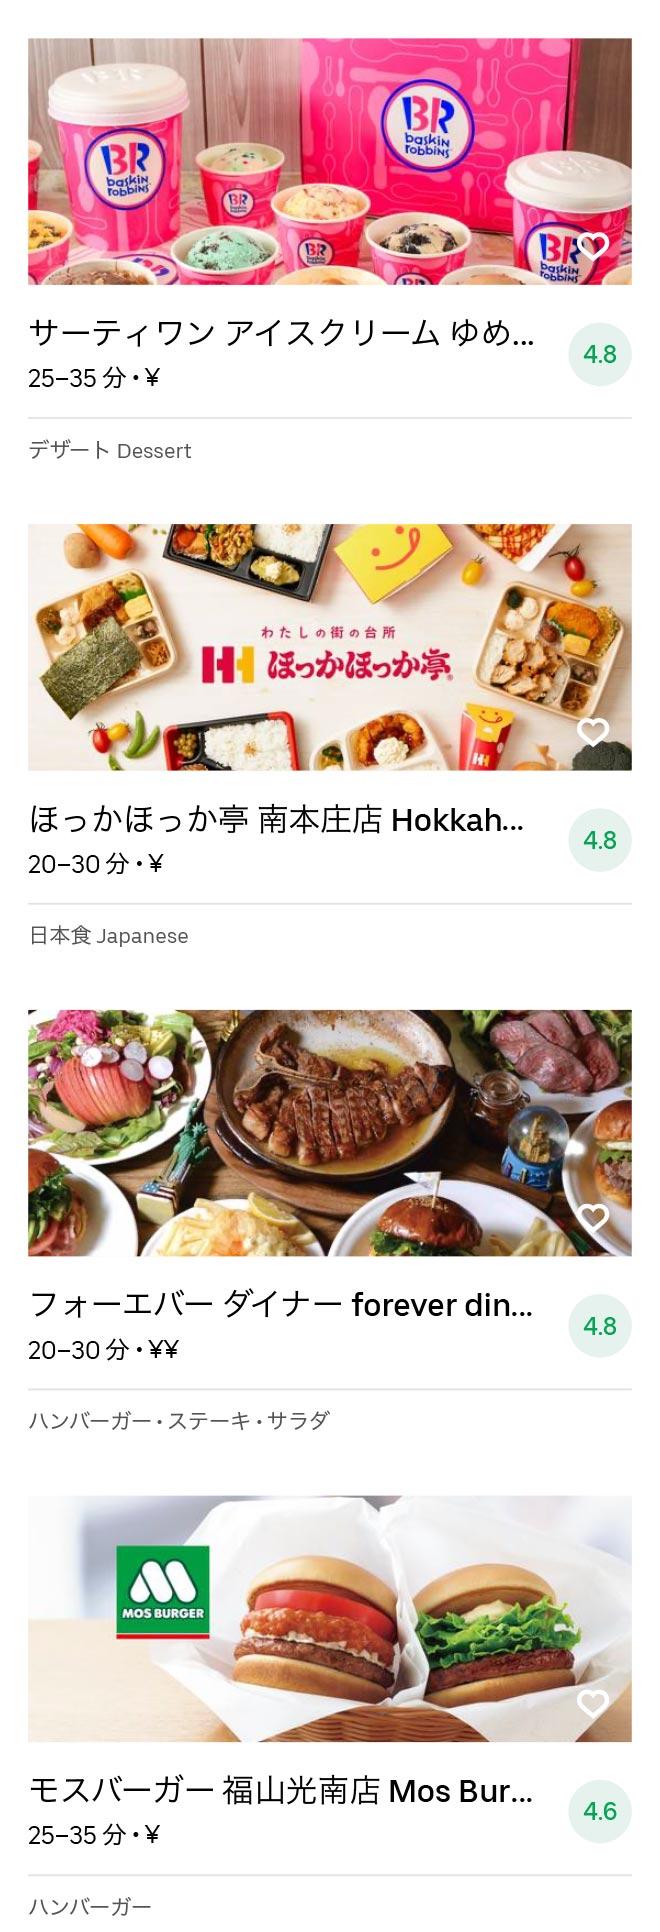 Fukuyama menu 2010 09